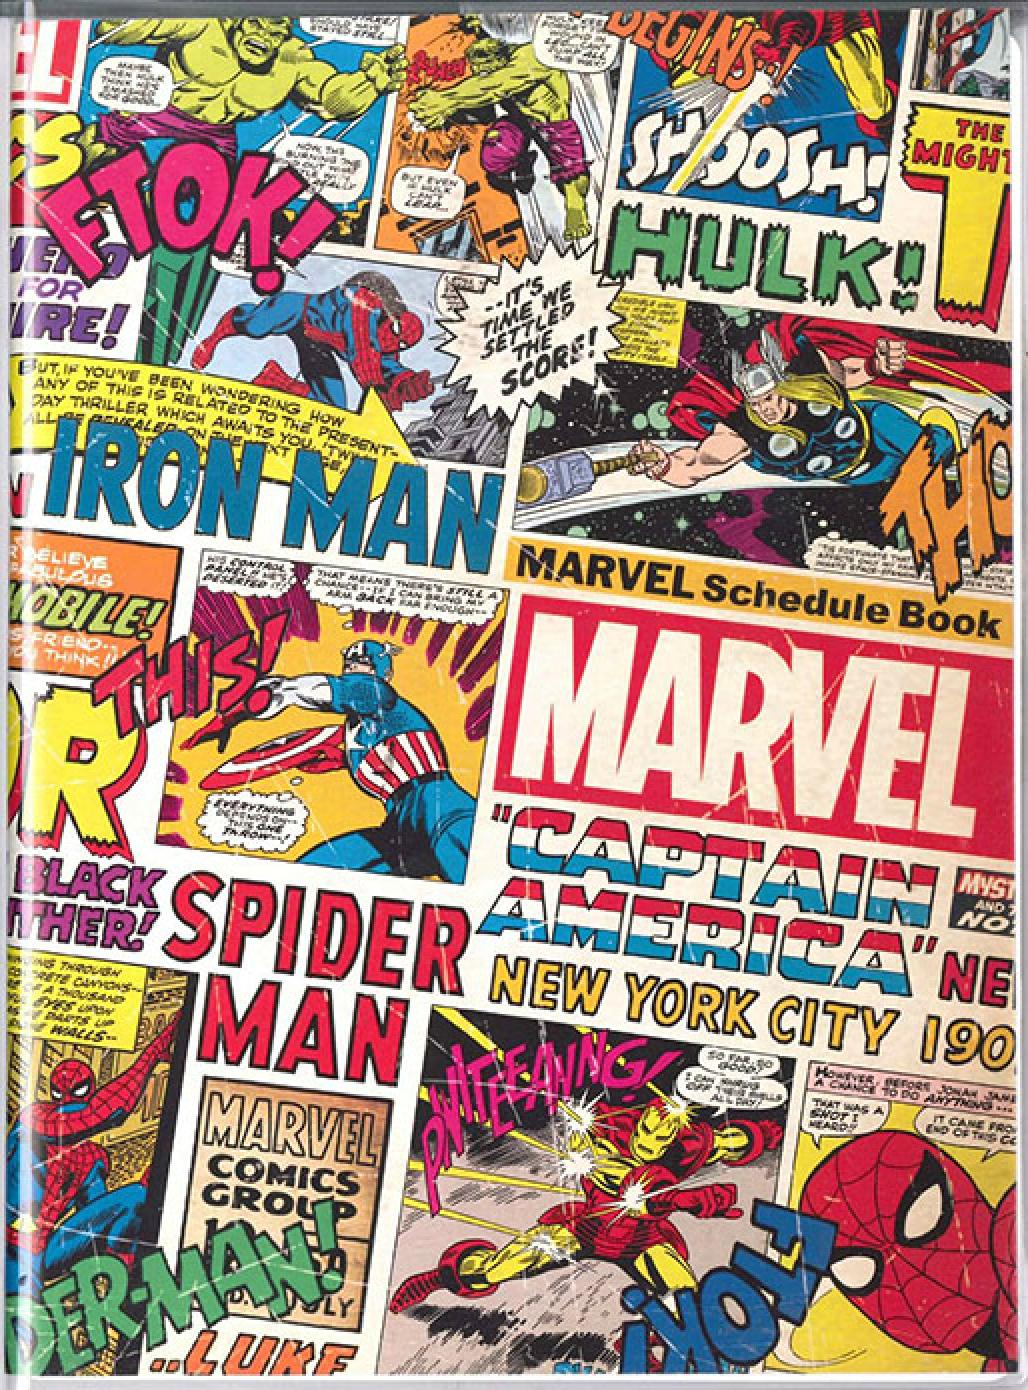 Marvel Comic Wallpaper Iphone 1028x1390 Download Hd Wallpaper Wallpapertip